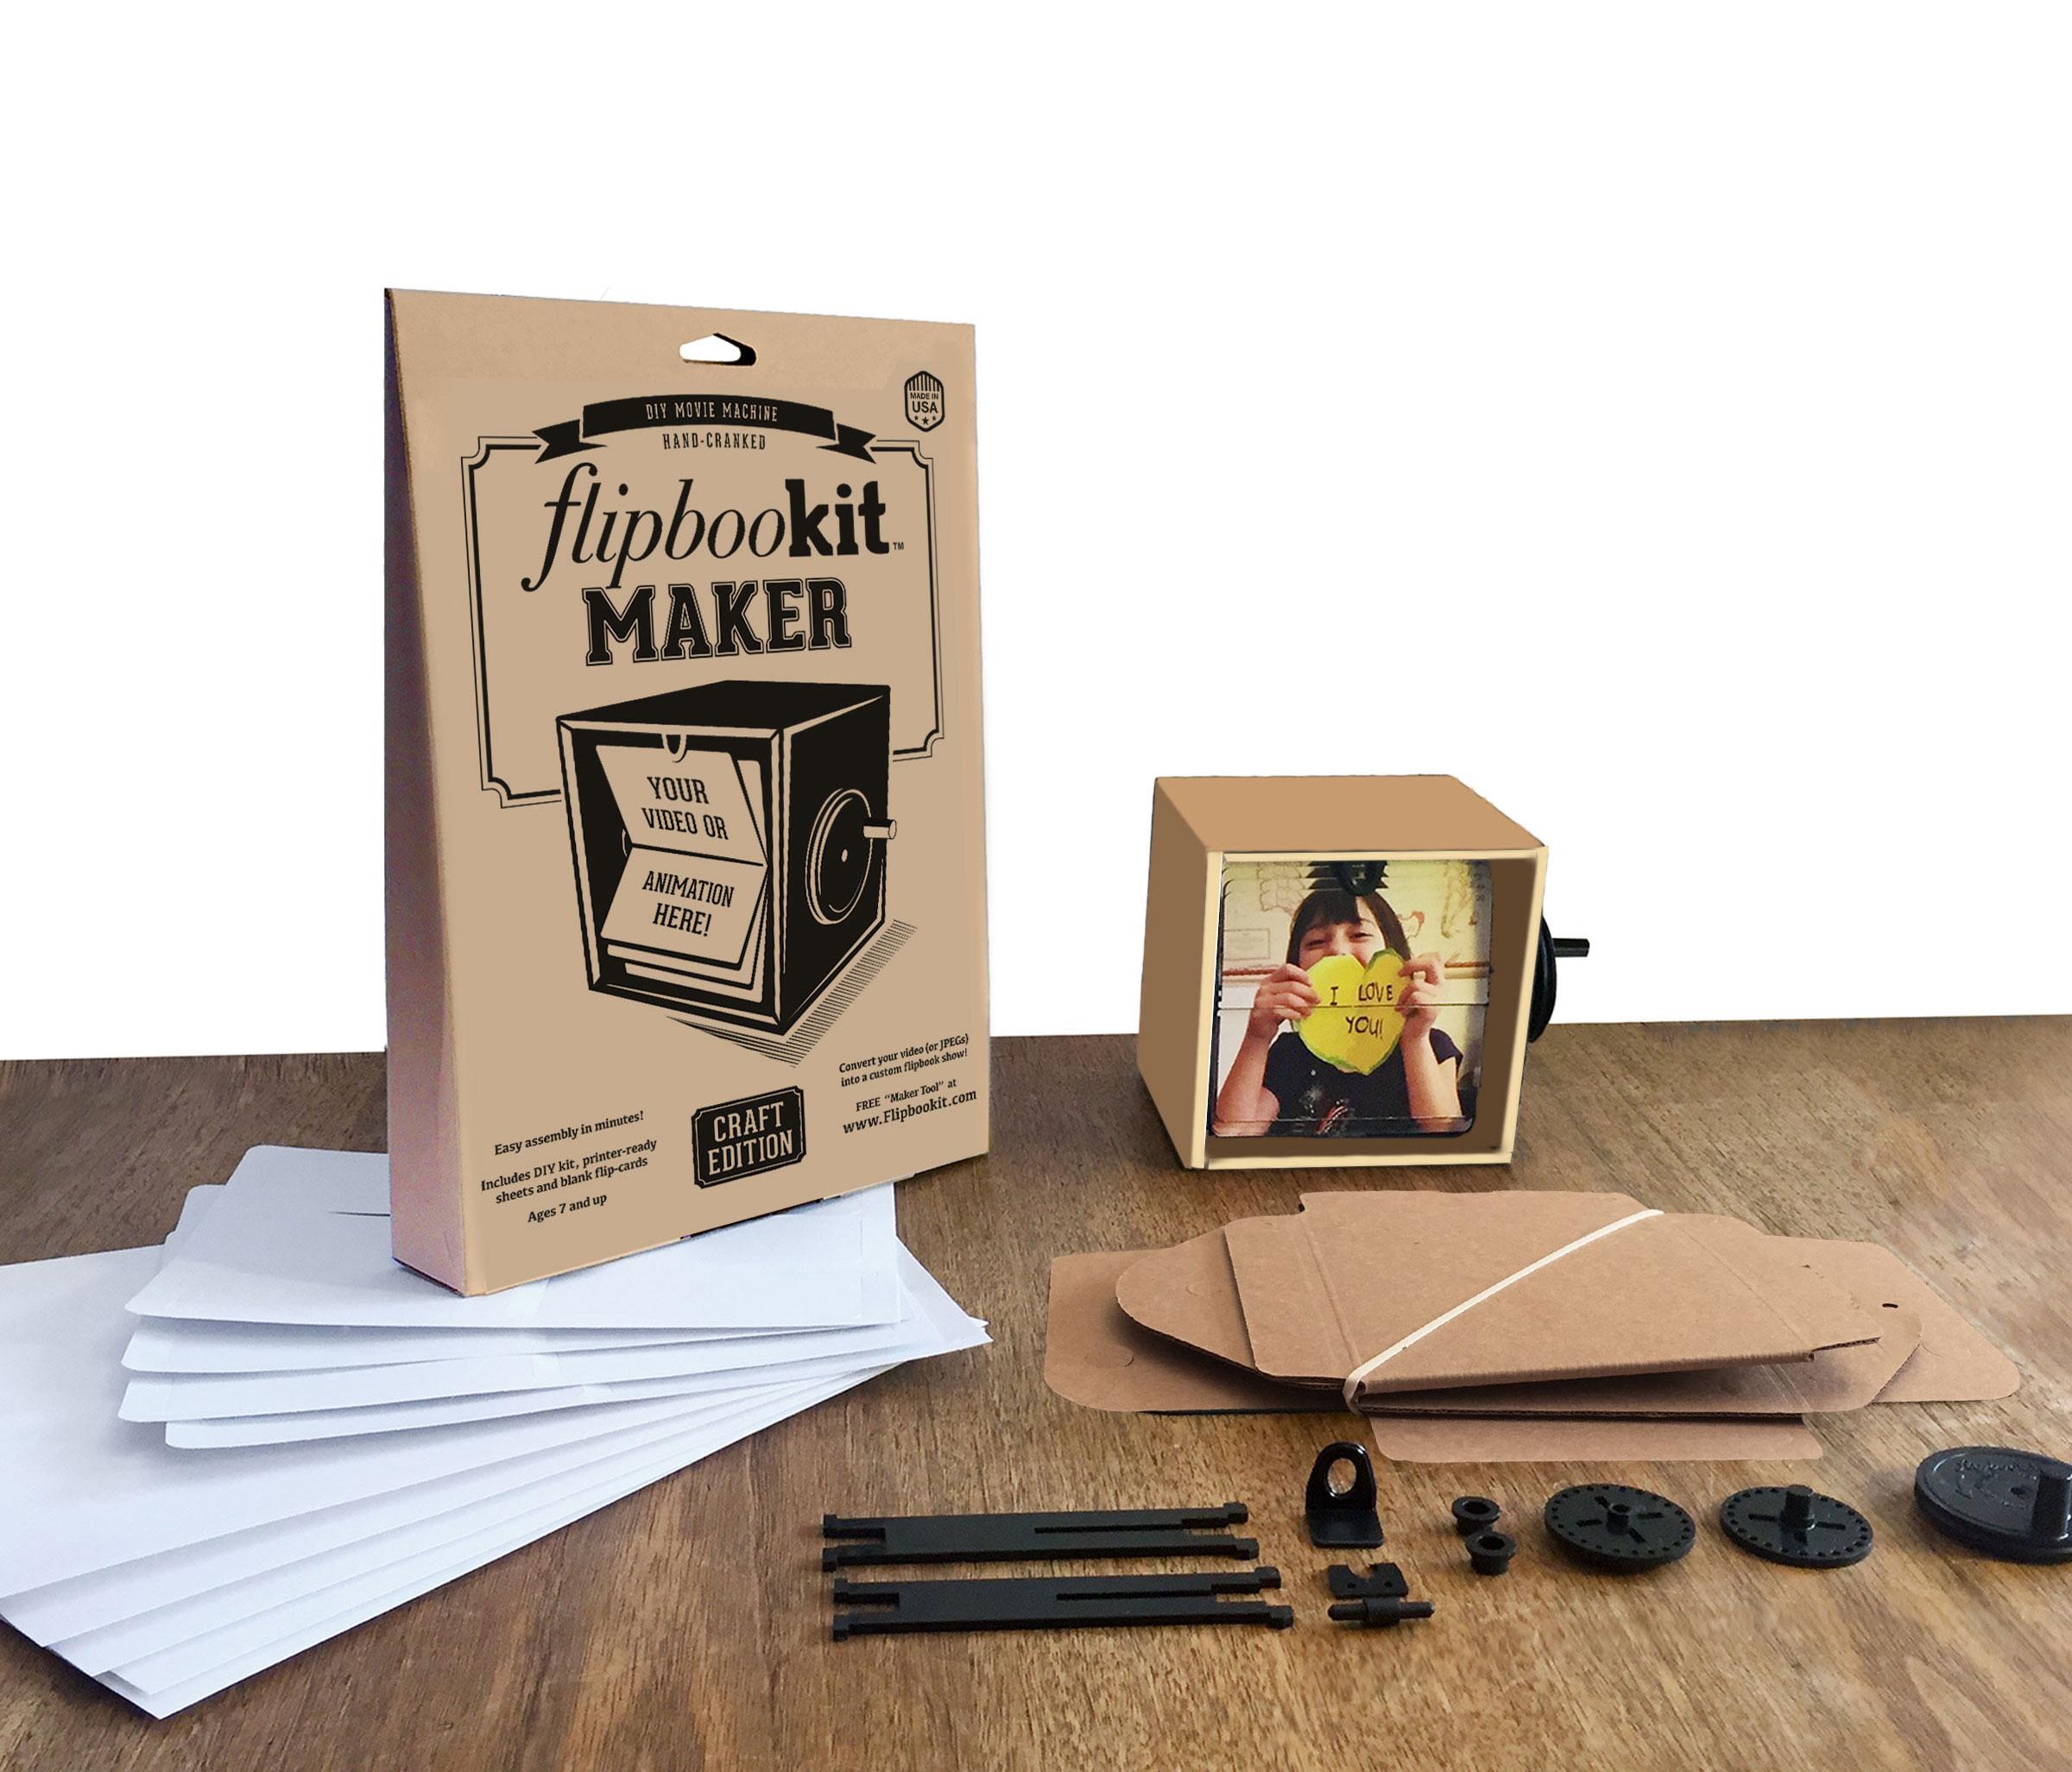 Maker kit contents FlipBooKit Flip book DIY Craft project maker kit